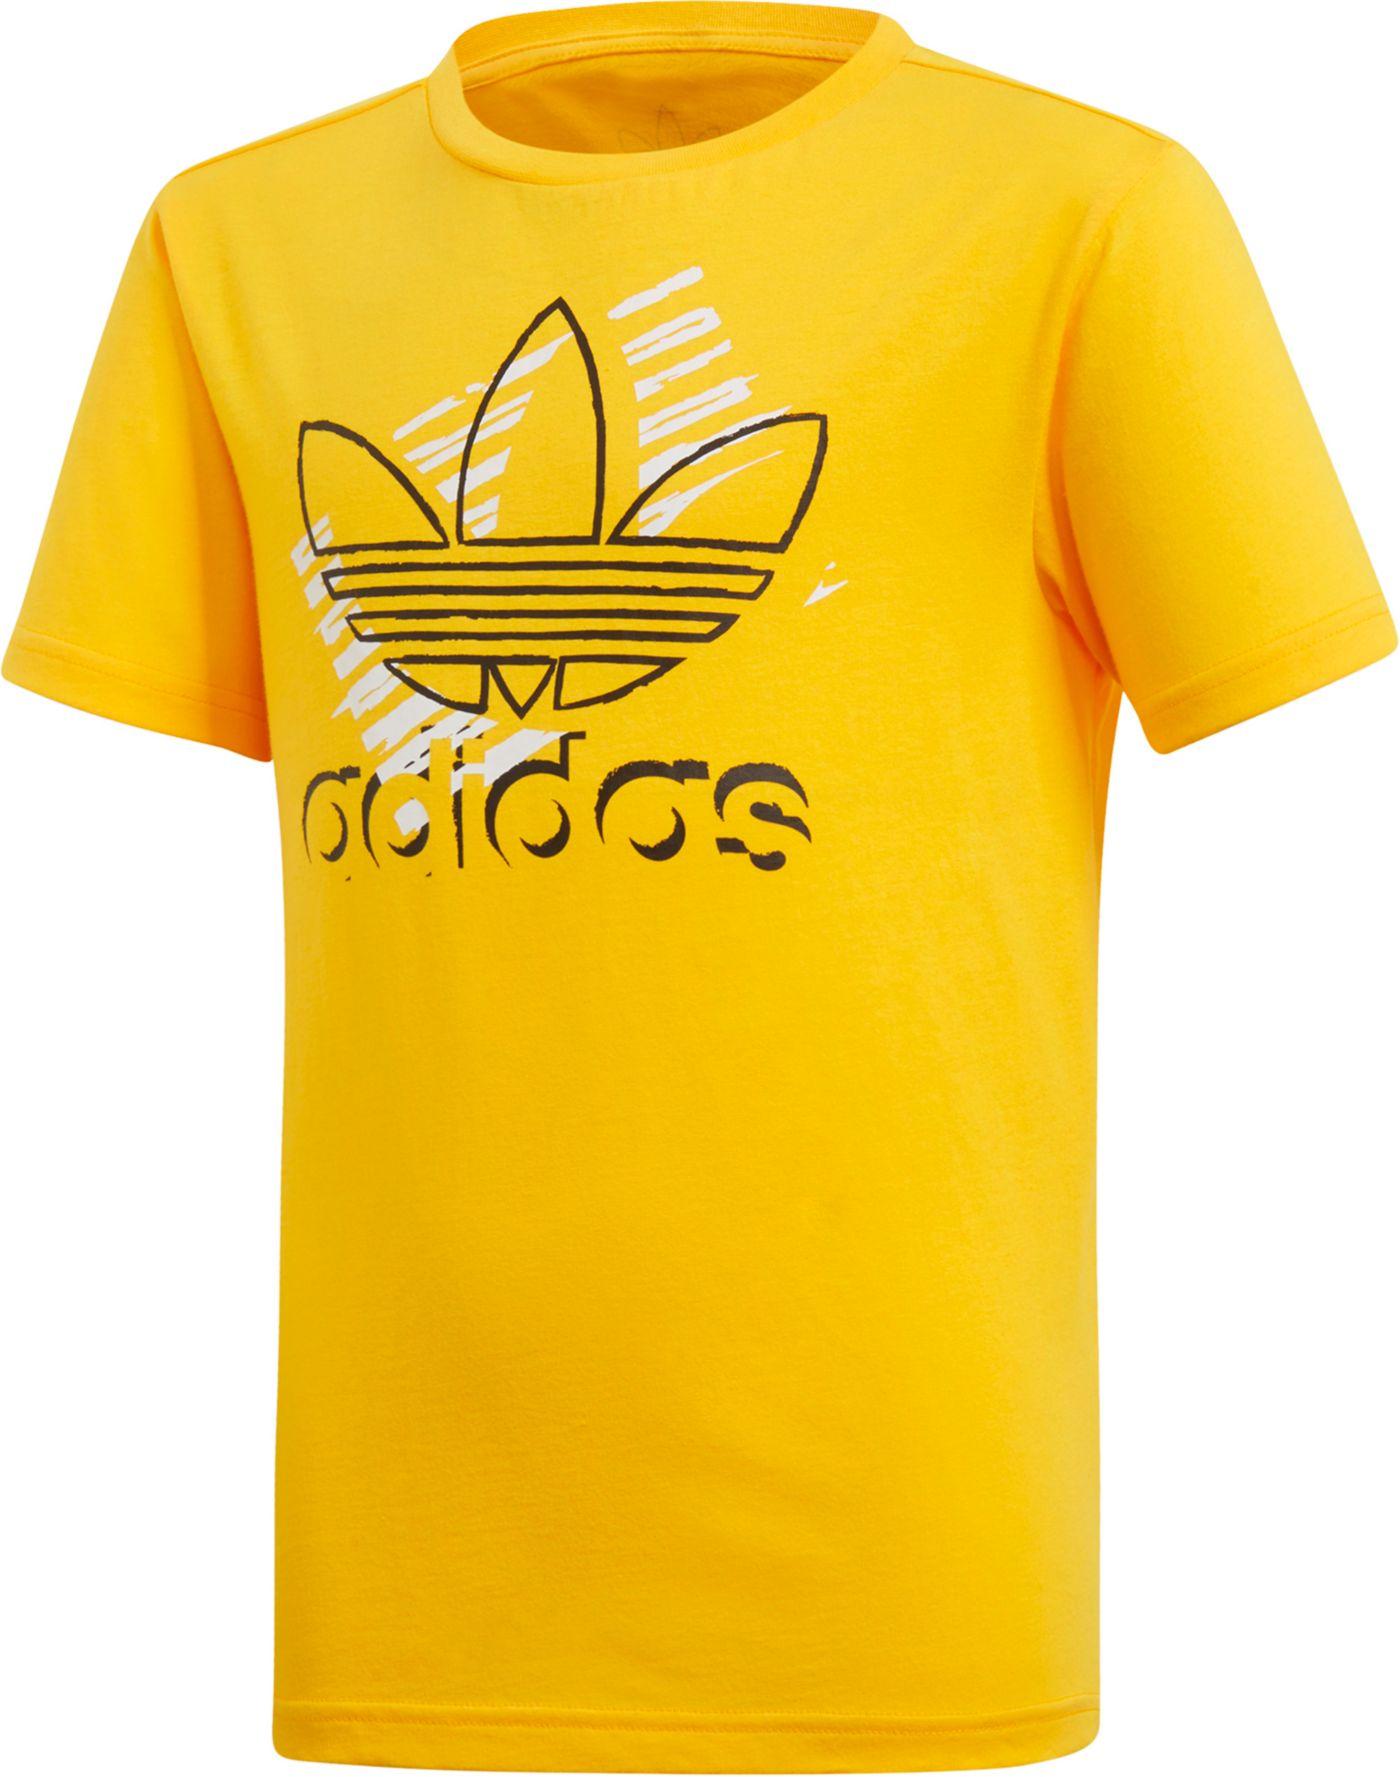 adidas Originals Boys' Trefoil Art Graphic T-Shirt